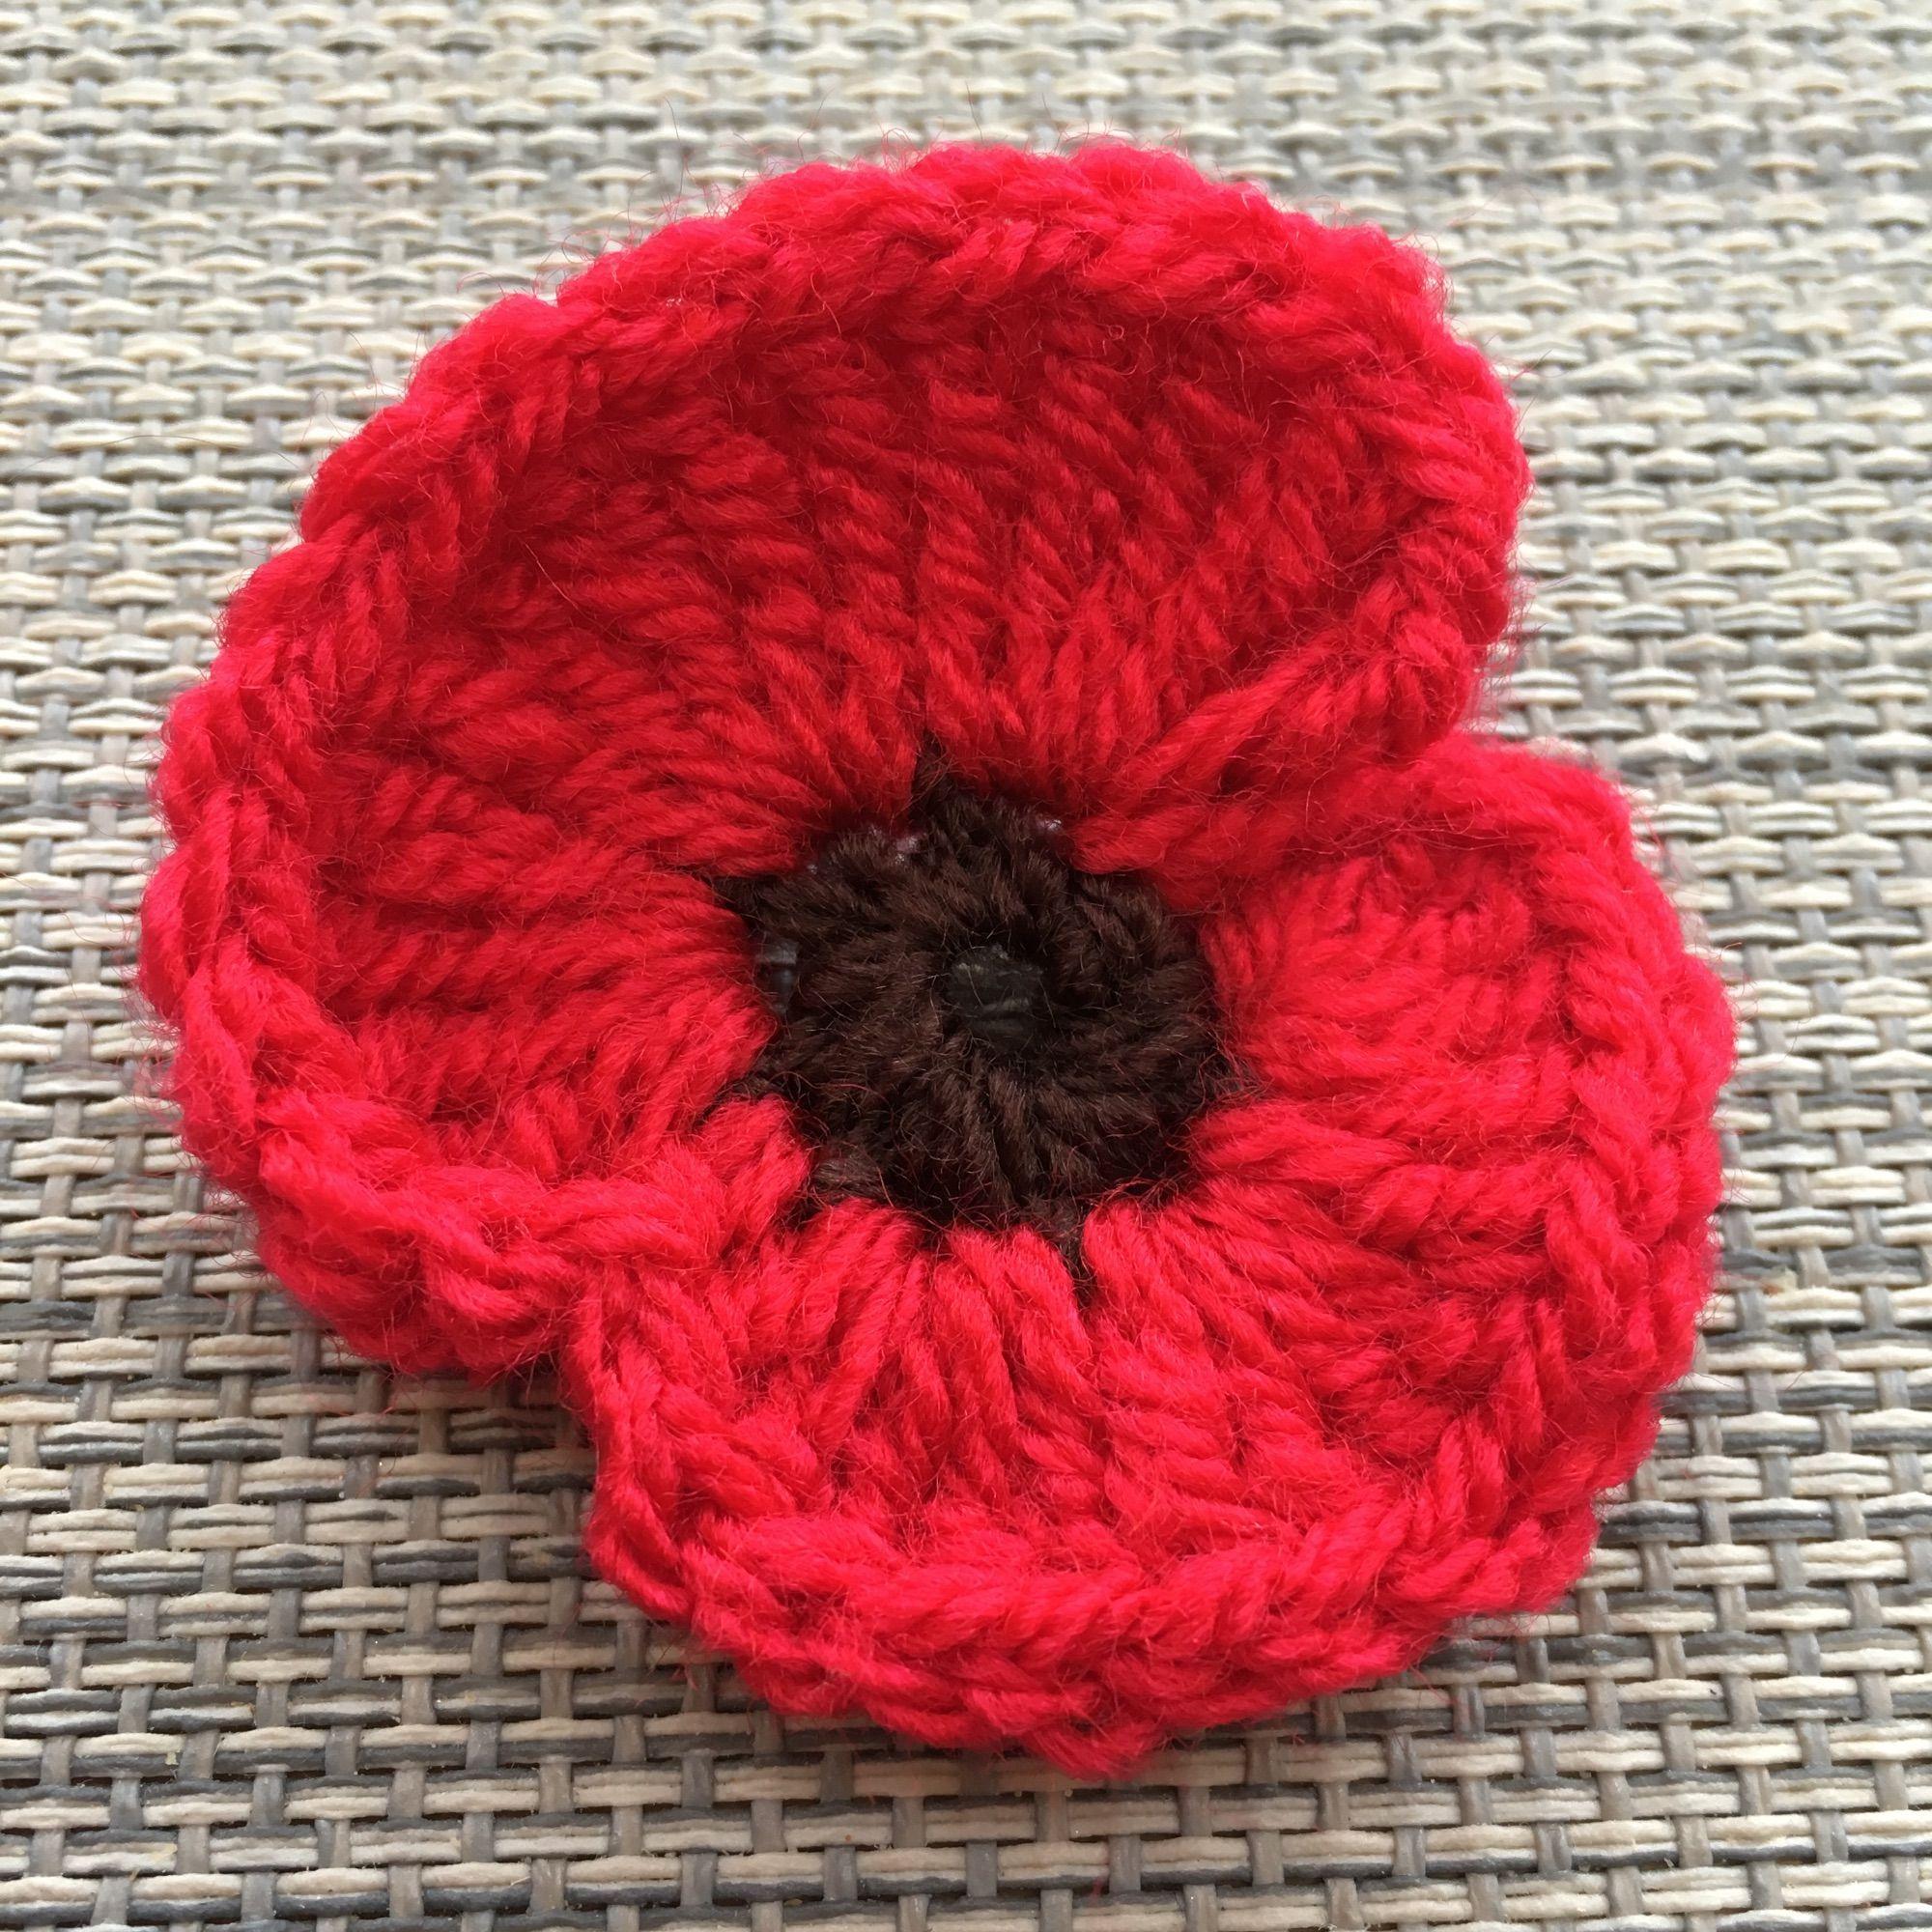 crochet poppy pattern | Crochet poppy pattern, Crochet ...